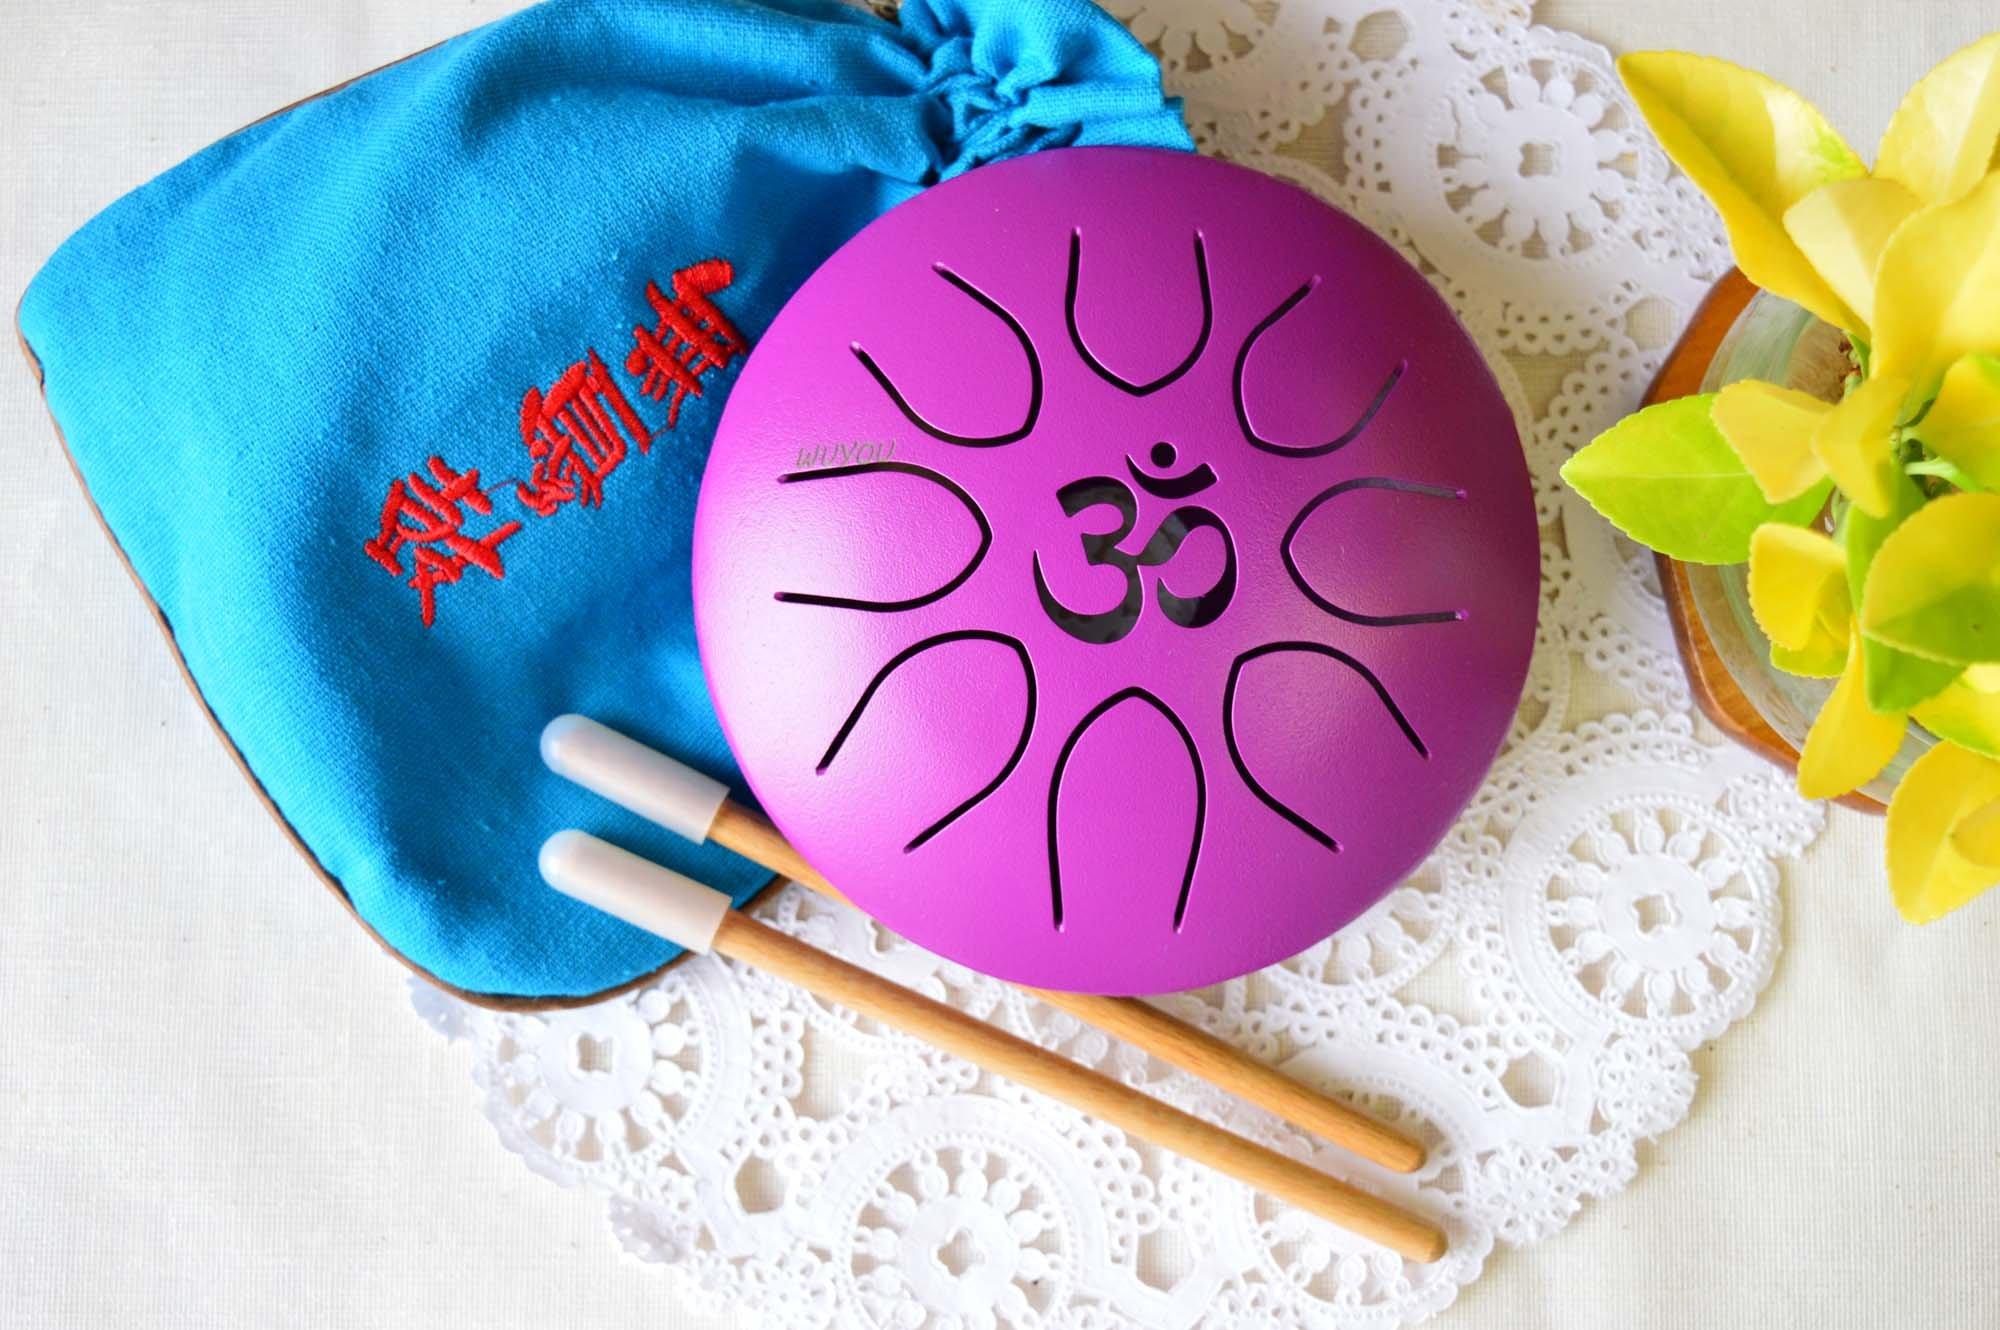 WuYou ॐ Symbol Chakra Drum Mini Tongue Drum Tank Handpan UFO series, Great for Meolodies Theropy (Purple)